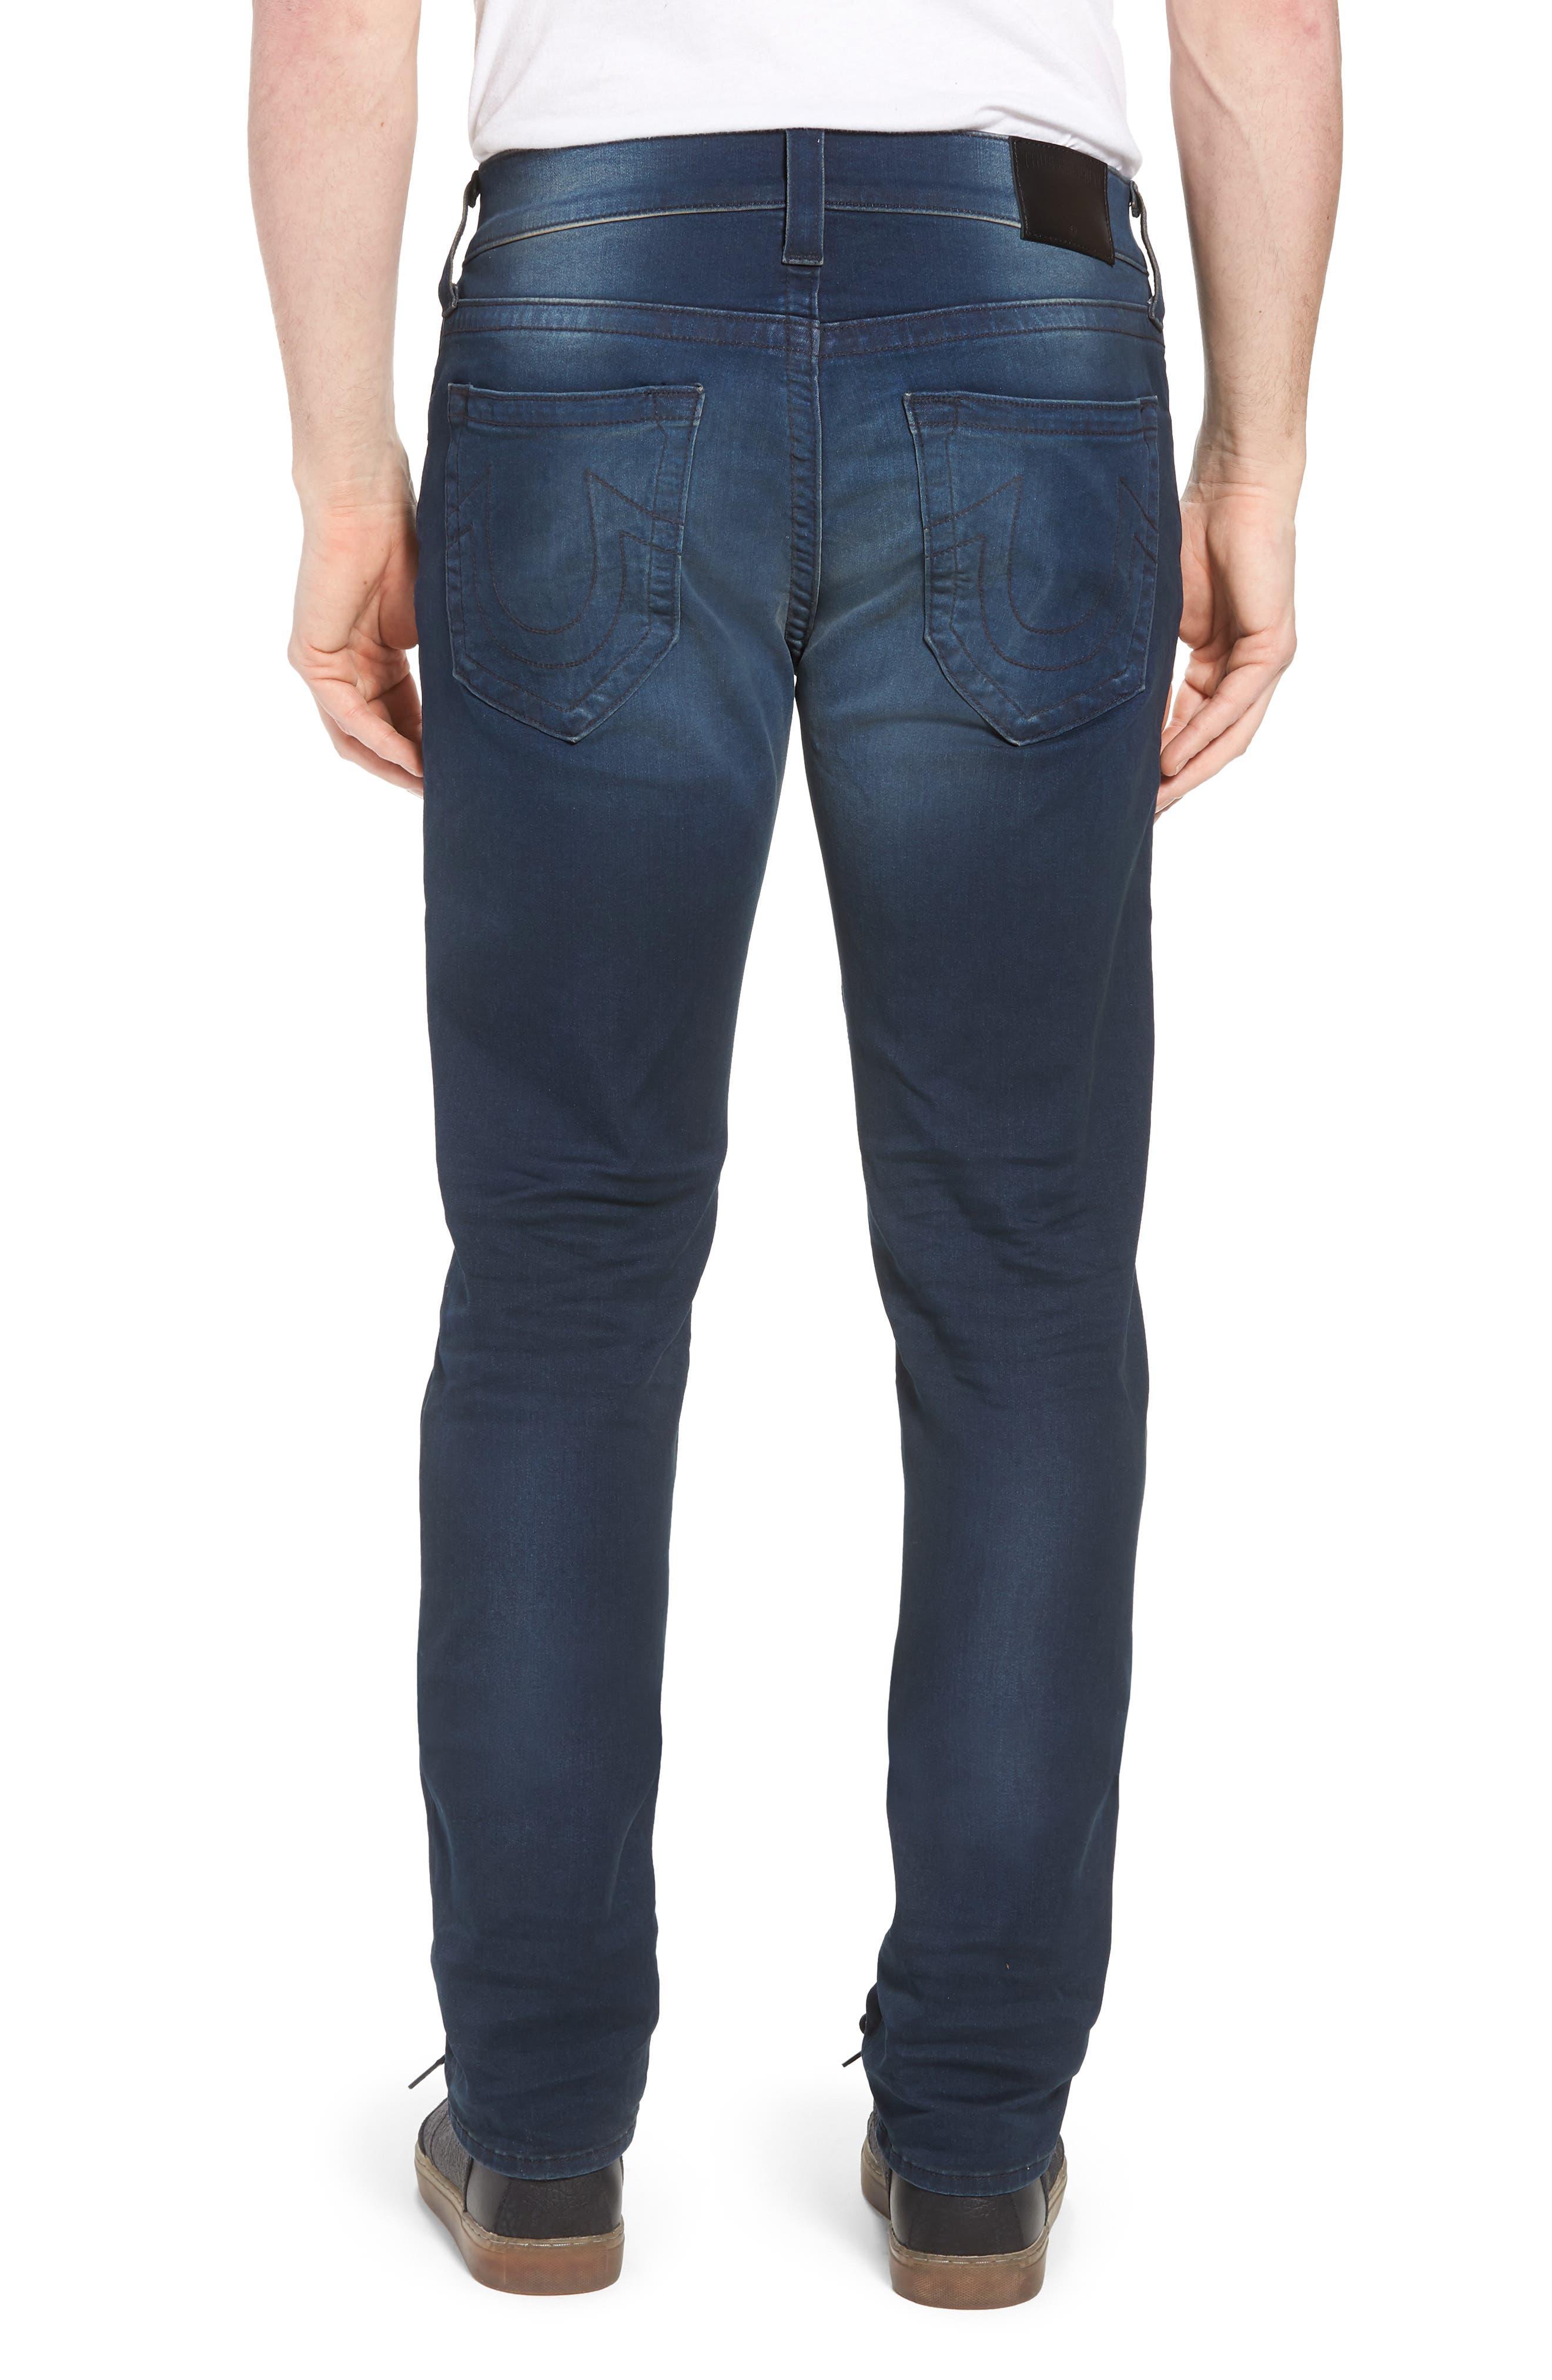 Geno Straight Leg Jeans,                             Alternate thumbnail 2, color,                             Dark Navy